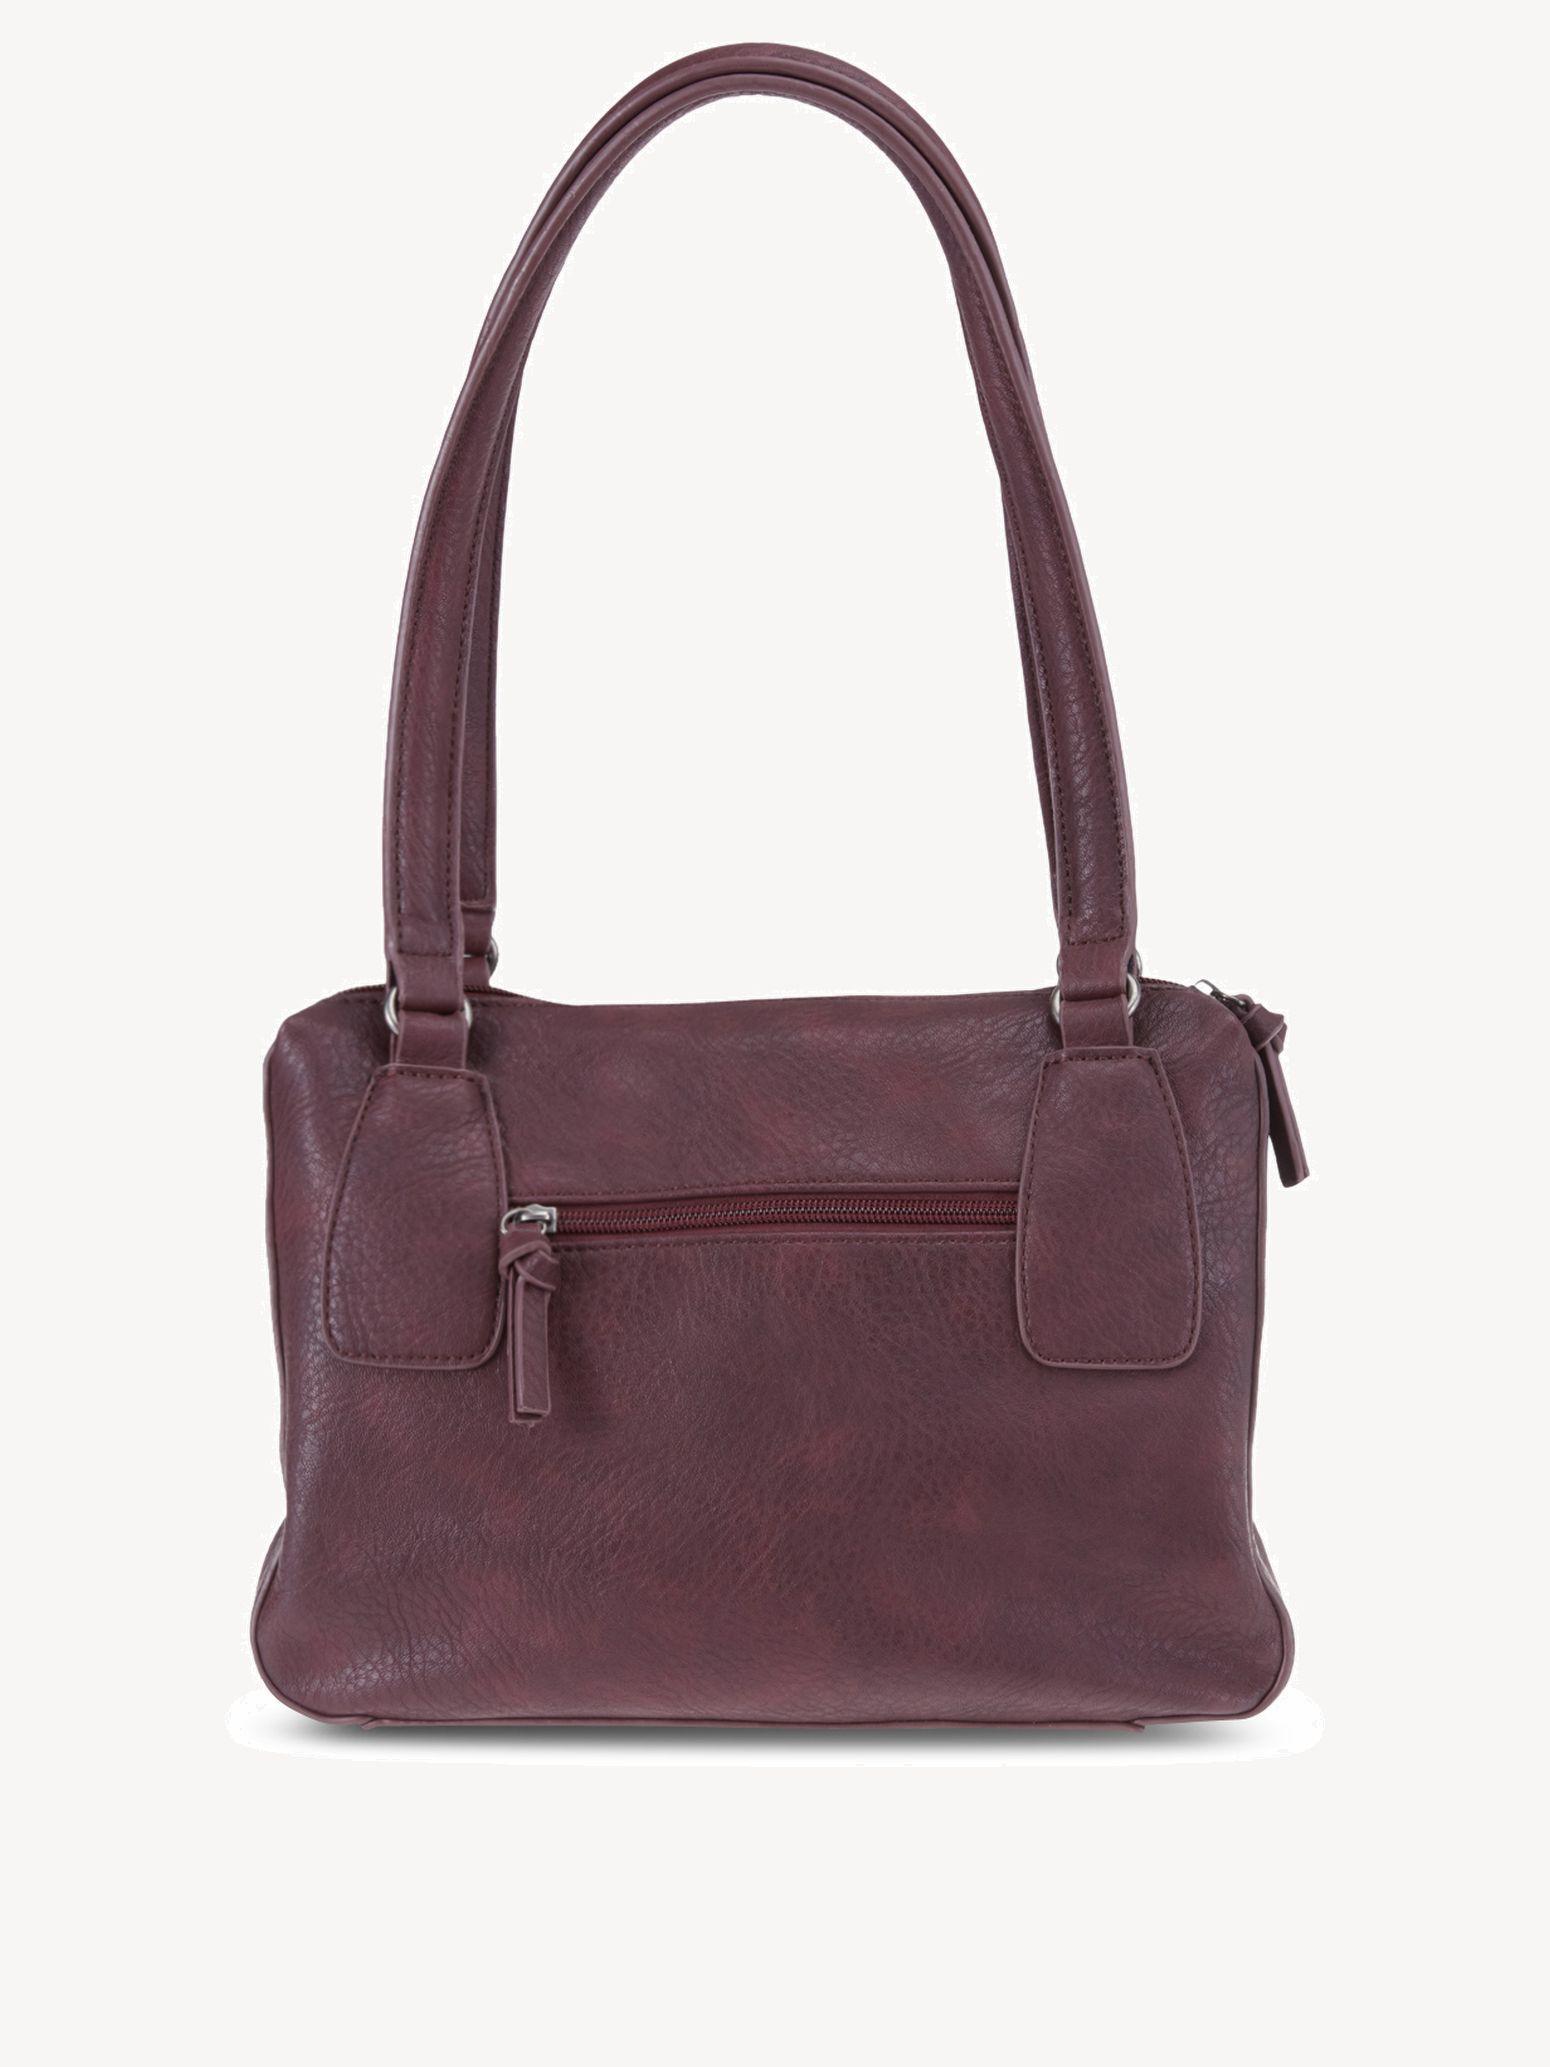 hayden 2367172 tamaris handtaschen online kaufen. Black Bedroom Furniture Sets. Home Design Ideas